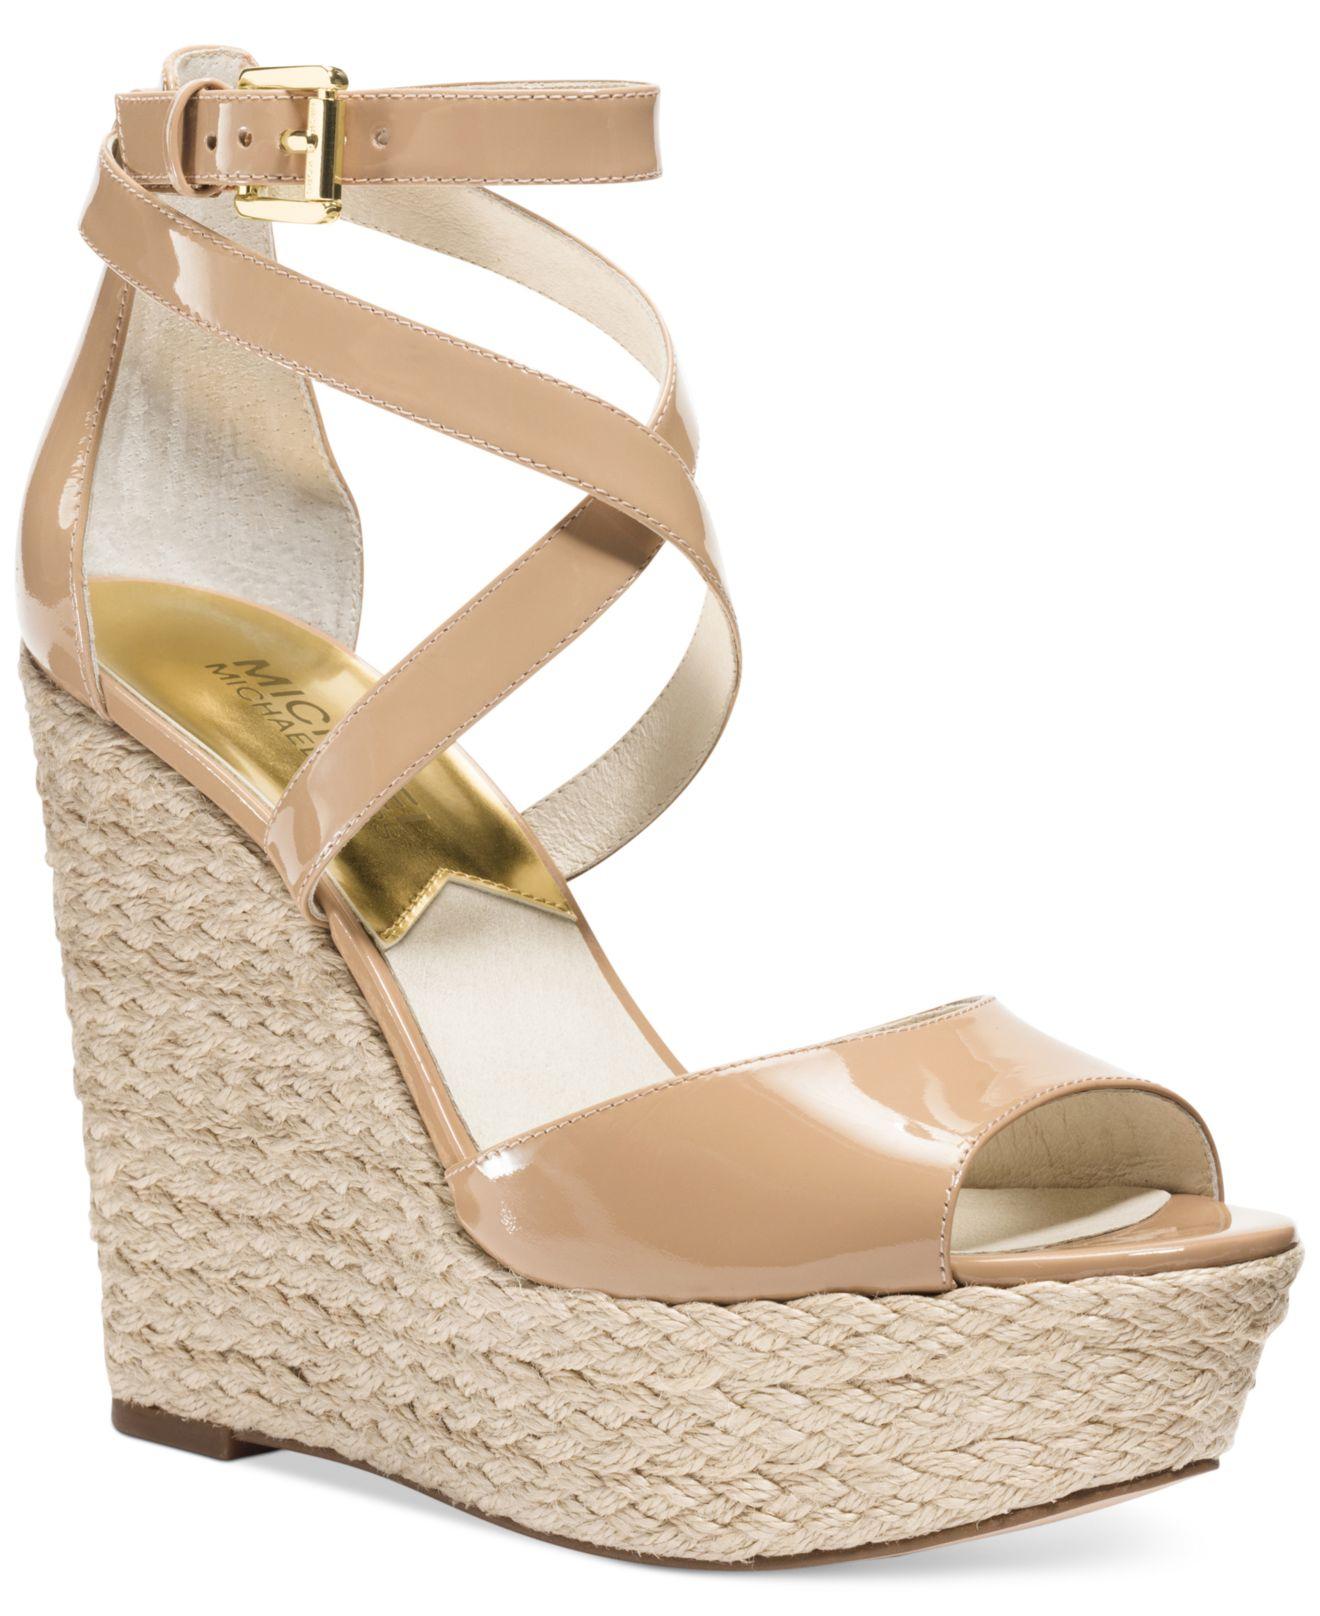 4ac3ccc70b4 Lyst - Michael Kors Michael Gabriella Platform Wedge Sandals in Natural